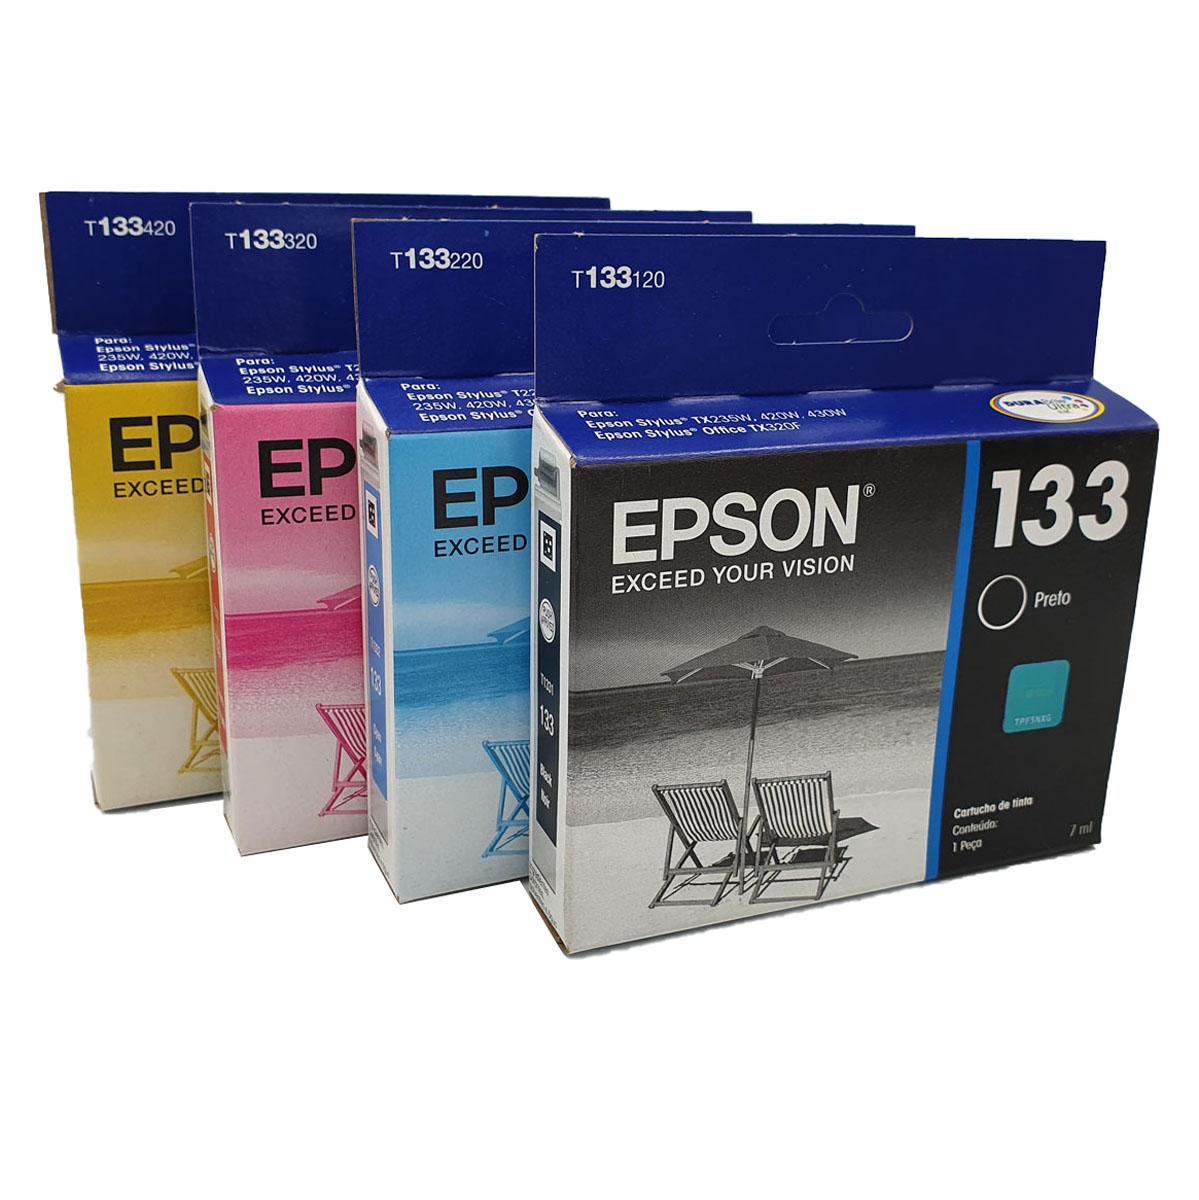 Kit 4 Cartuchos EPSON T133 133 para TX235W TX420W TX430W TX320F